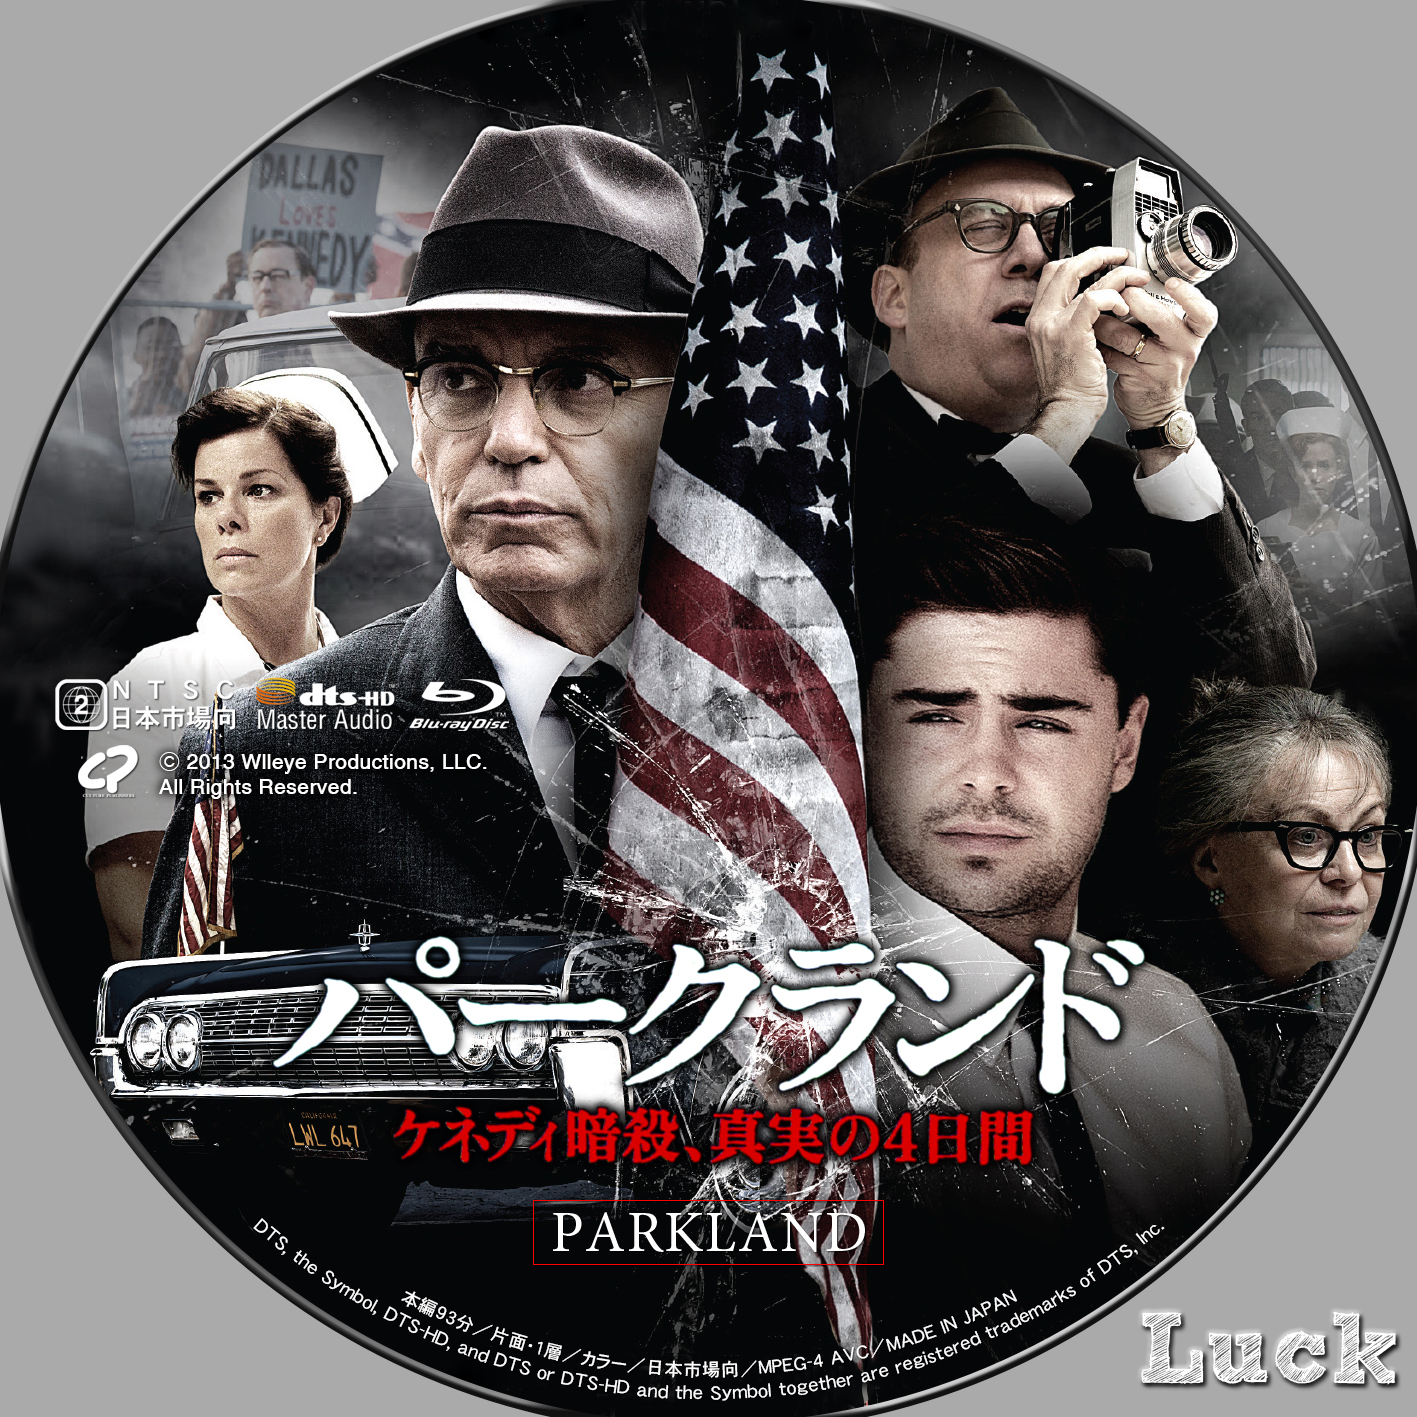 DVDカスタムレーベル ラック2パークランド ケネディ暗殺、真実の4日間(2013)トラックバックURL